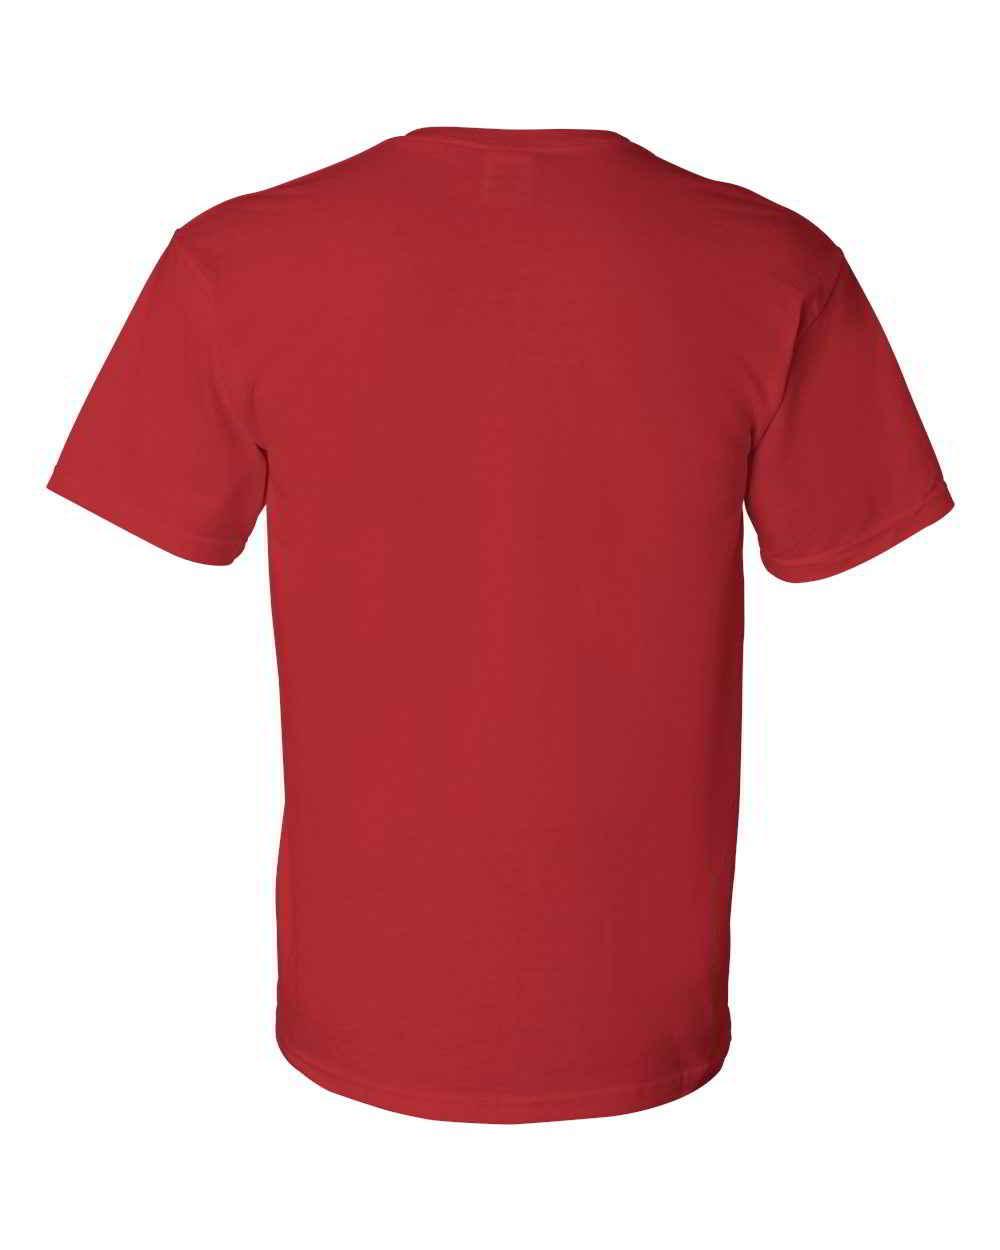 Gildan-DryBlend-Mens-50-50-Short-Sleeve-Tees-T-Shirt-with-a-Pocket thumbnail 9